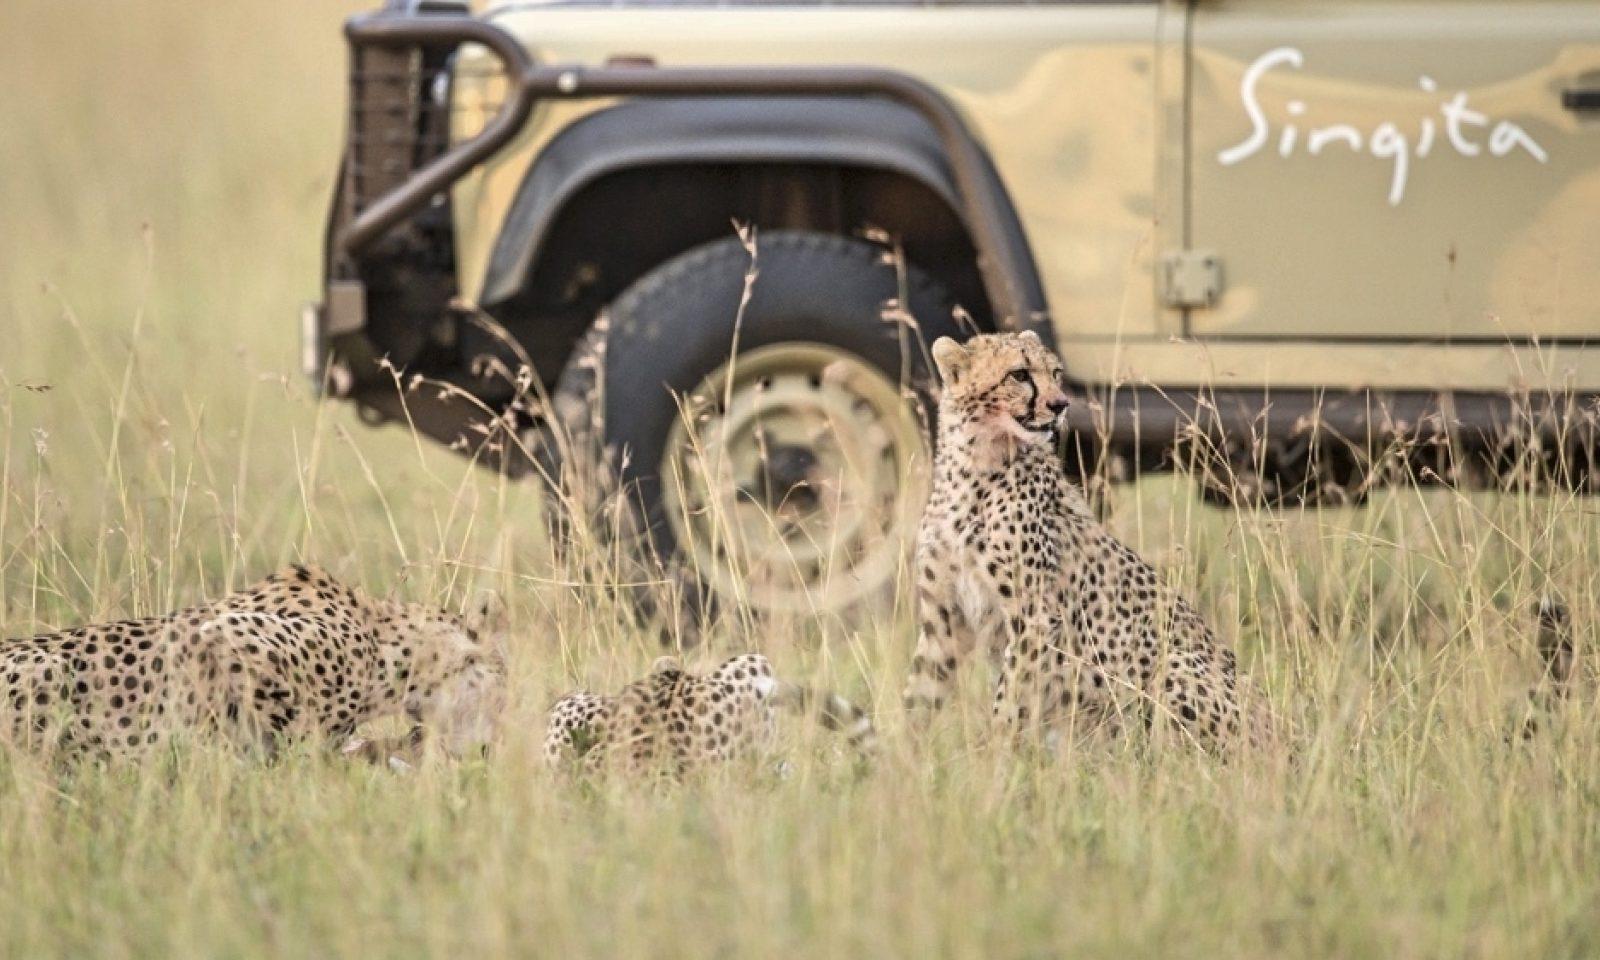 Singita Serengeti Game Drive